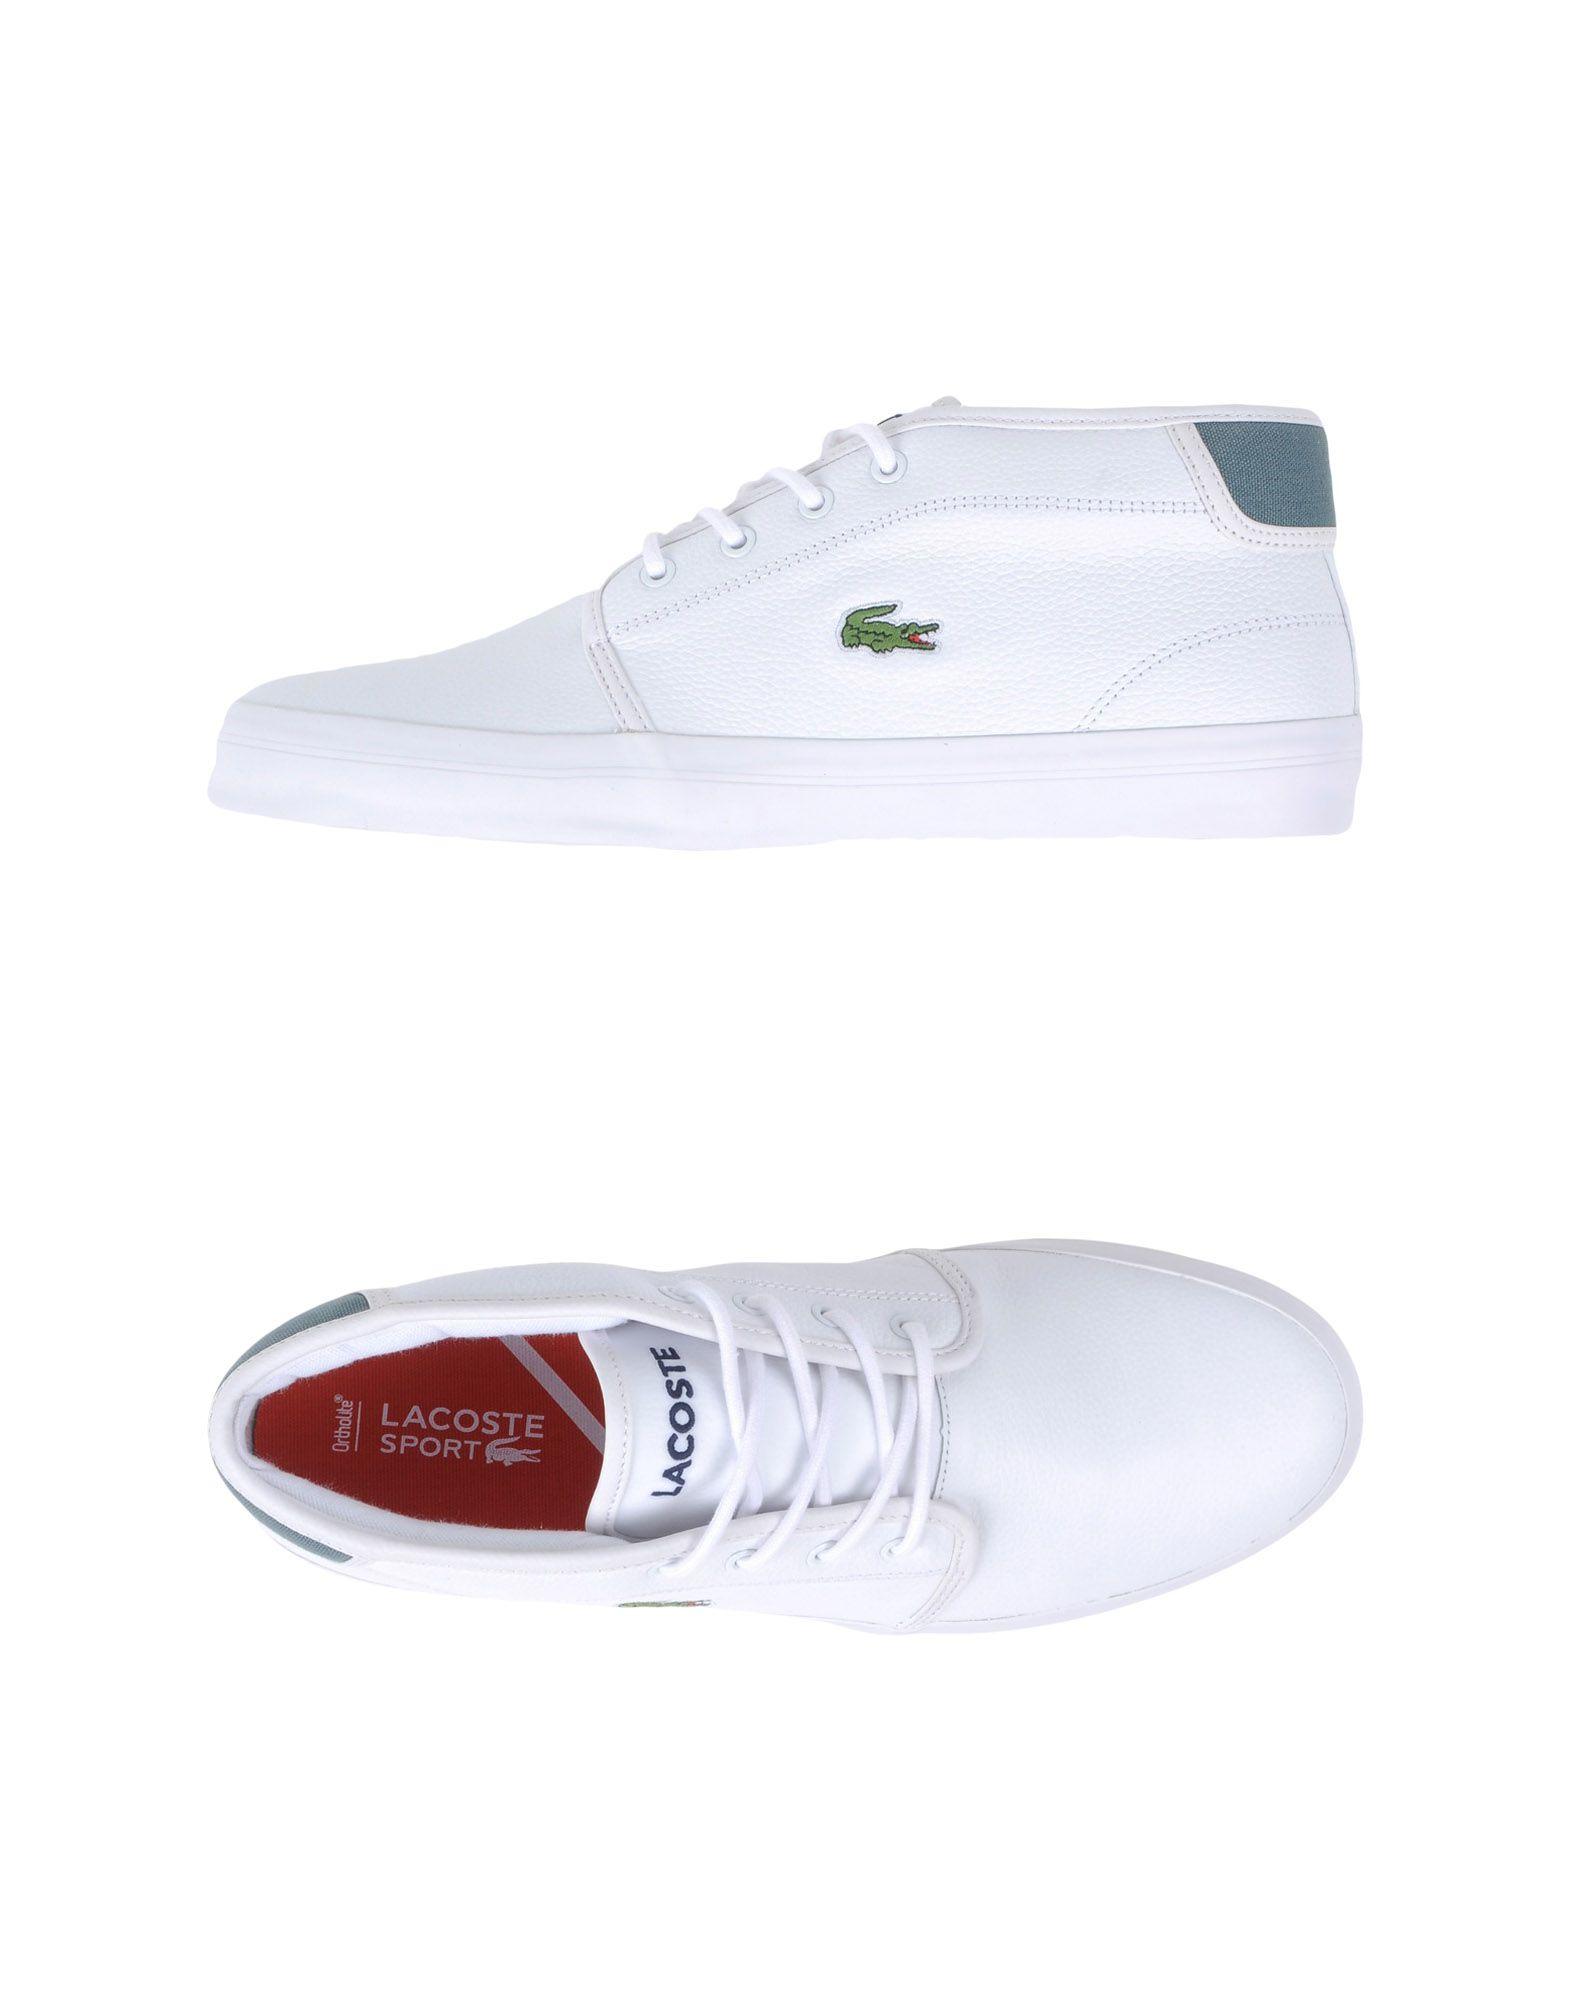 lacoste sport hightops amp sneakers in white lyst